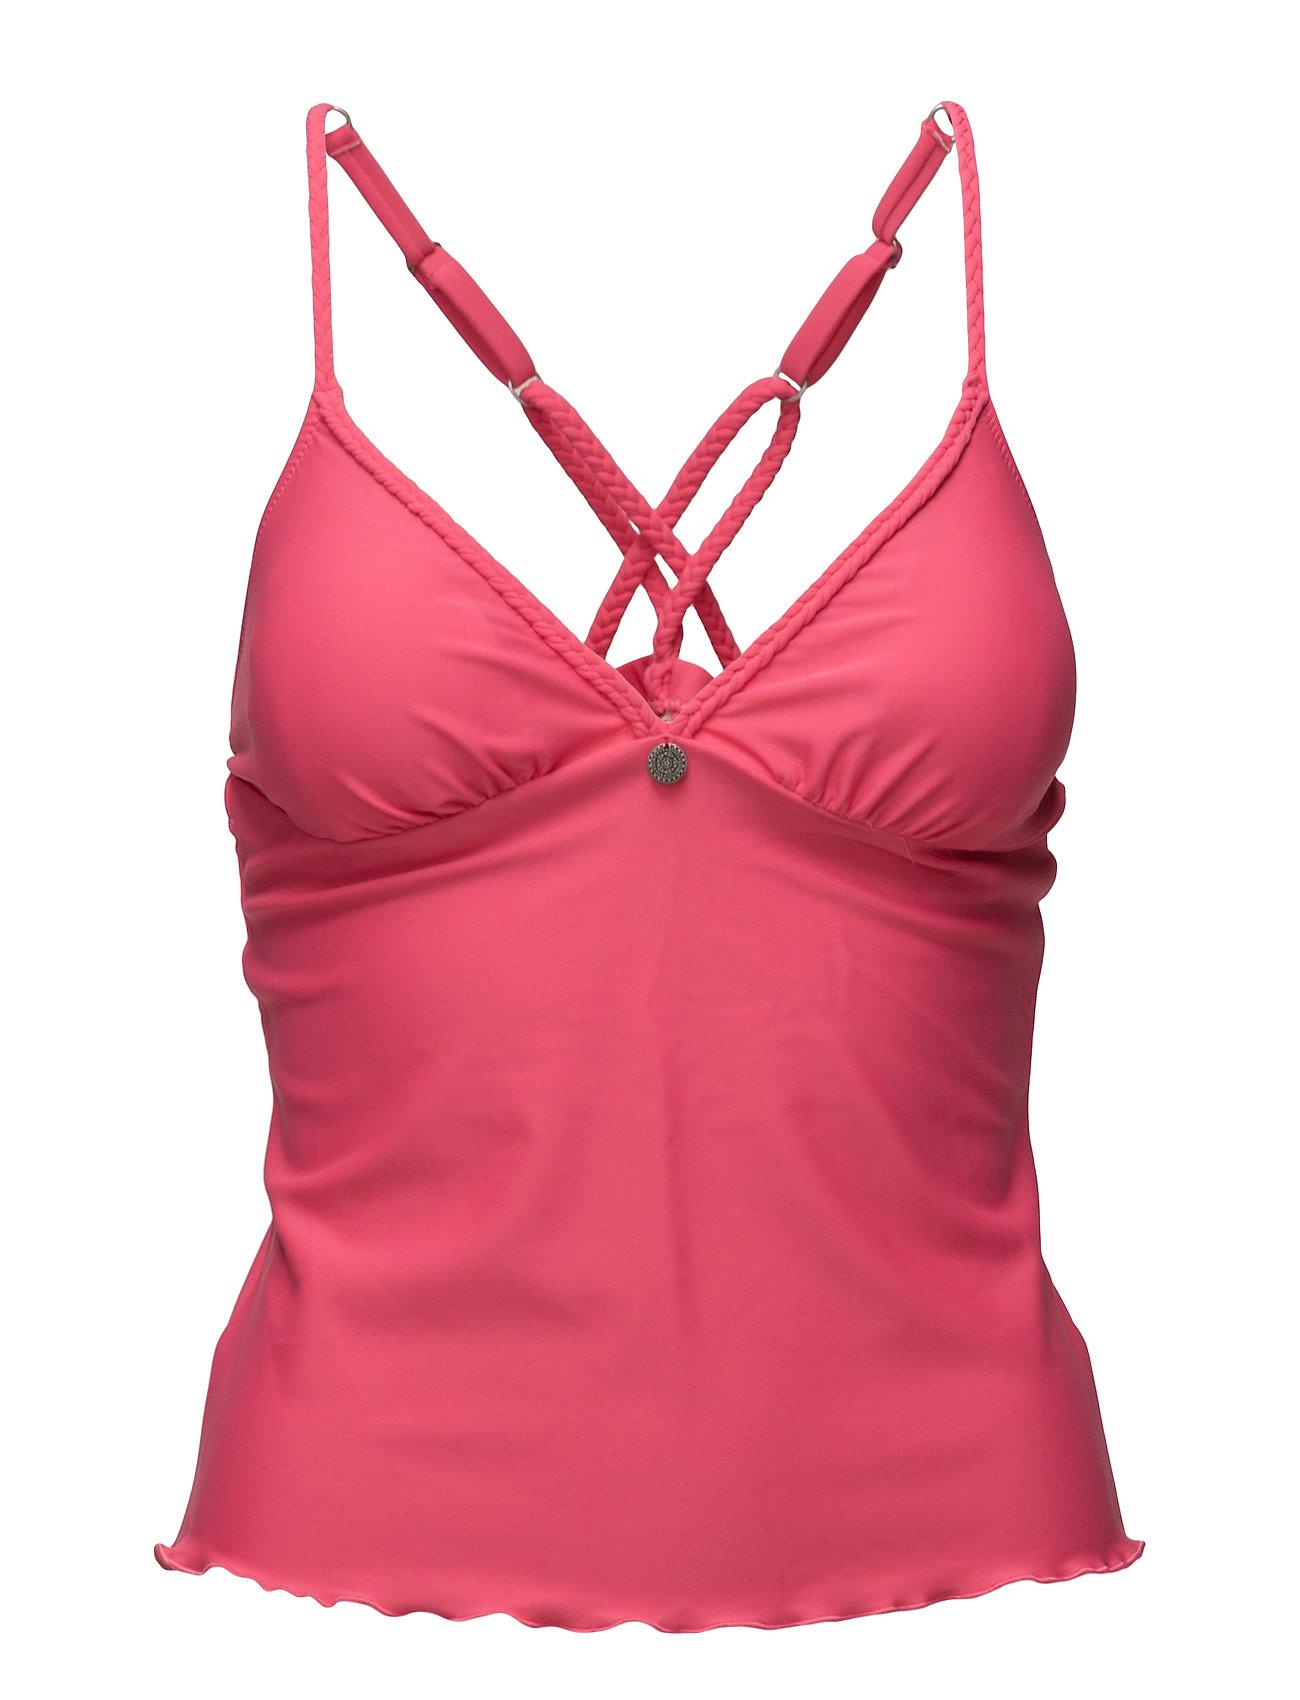 Redondo tankini top fra odd molly underwear & swimwear på boozt.com dk